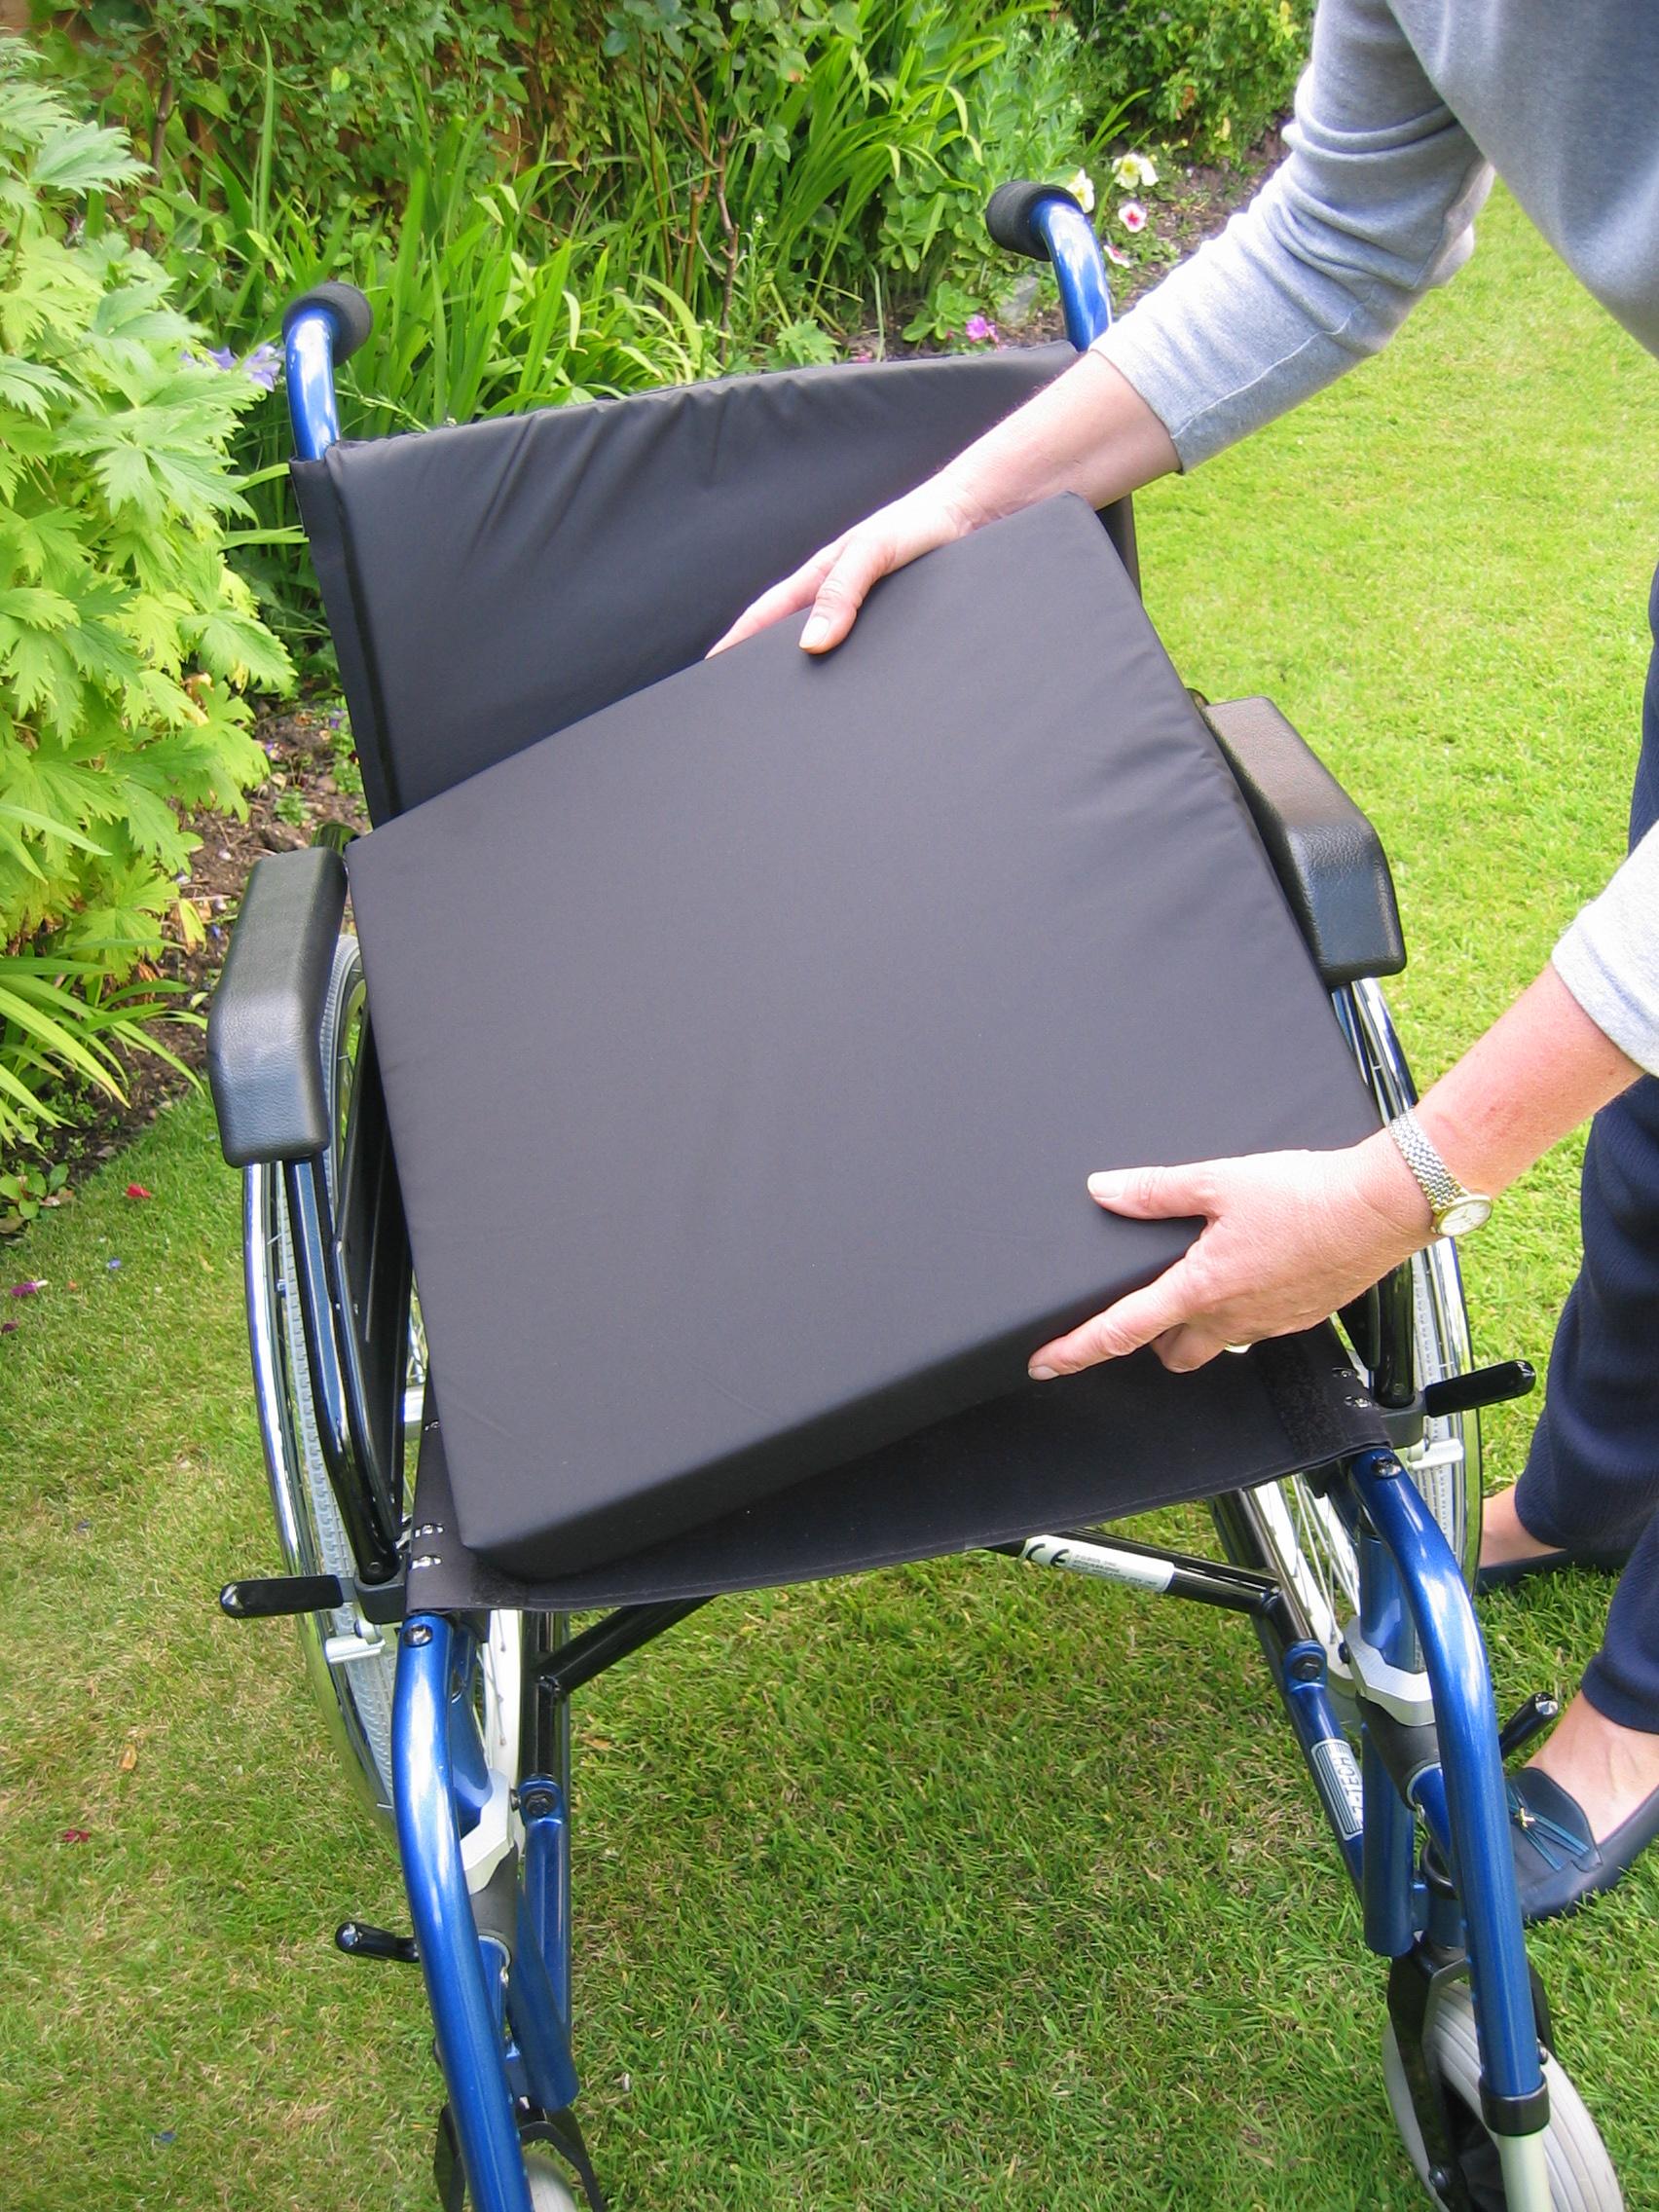 Comprar cojin impermeable para sillas de ruedas mejor - Cojin para silla ...